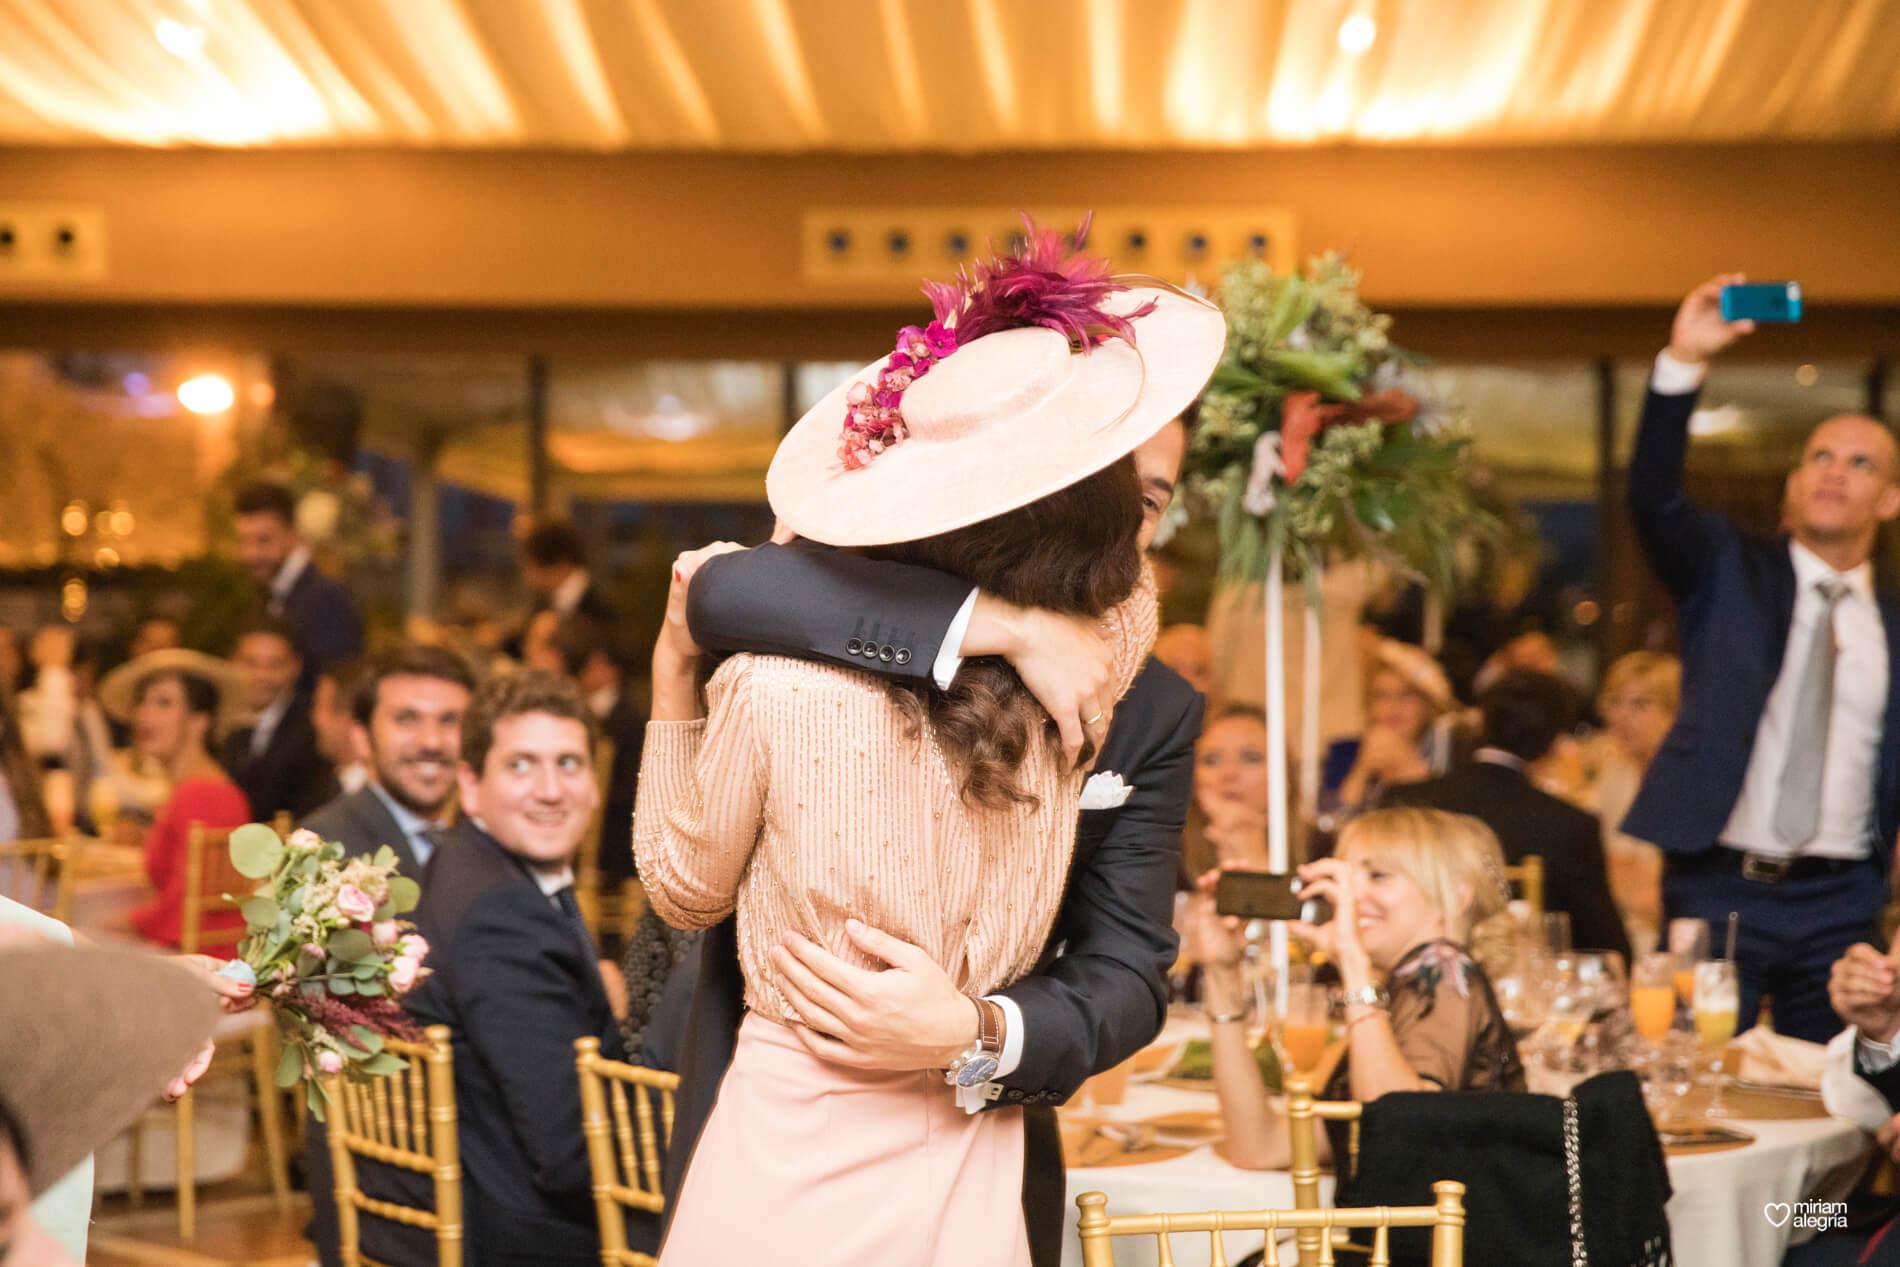 vestido-de-novia-paula-del-vas-miriam-alegria-fotografos-boda-murcia-128